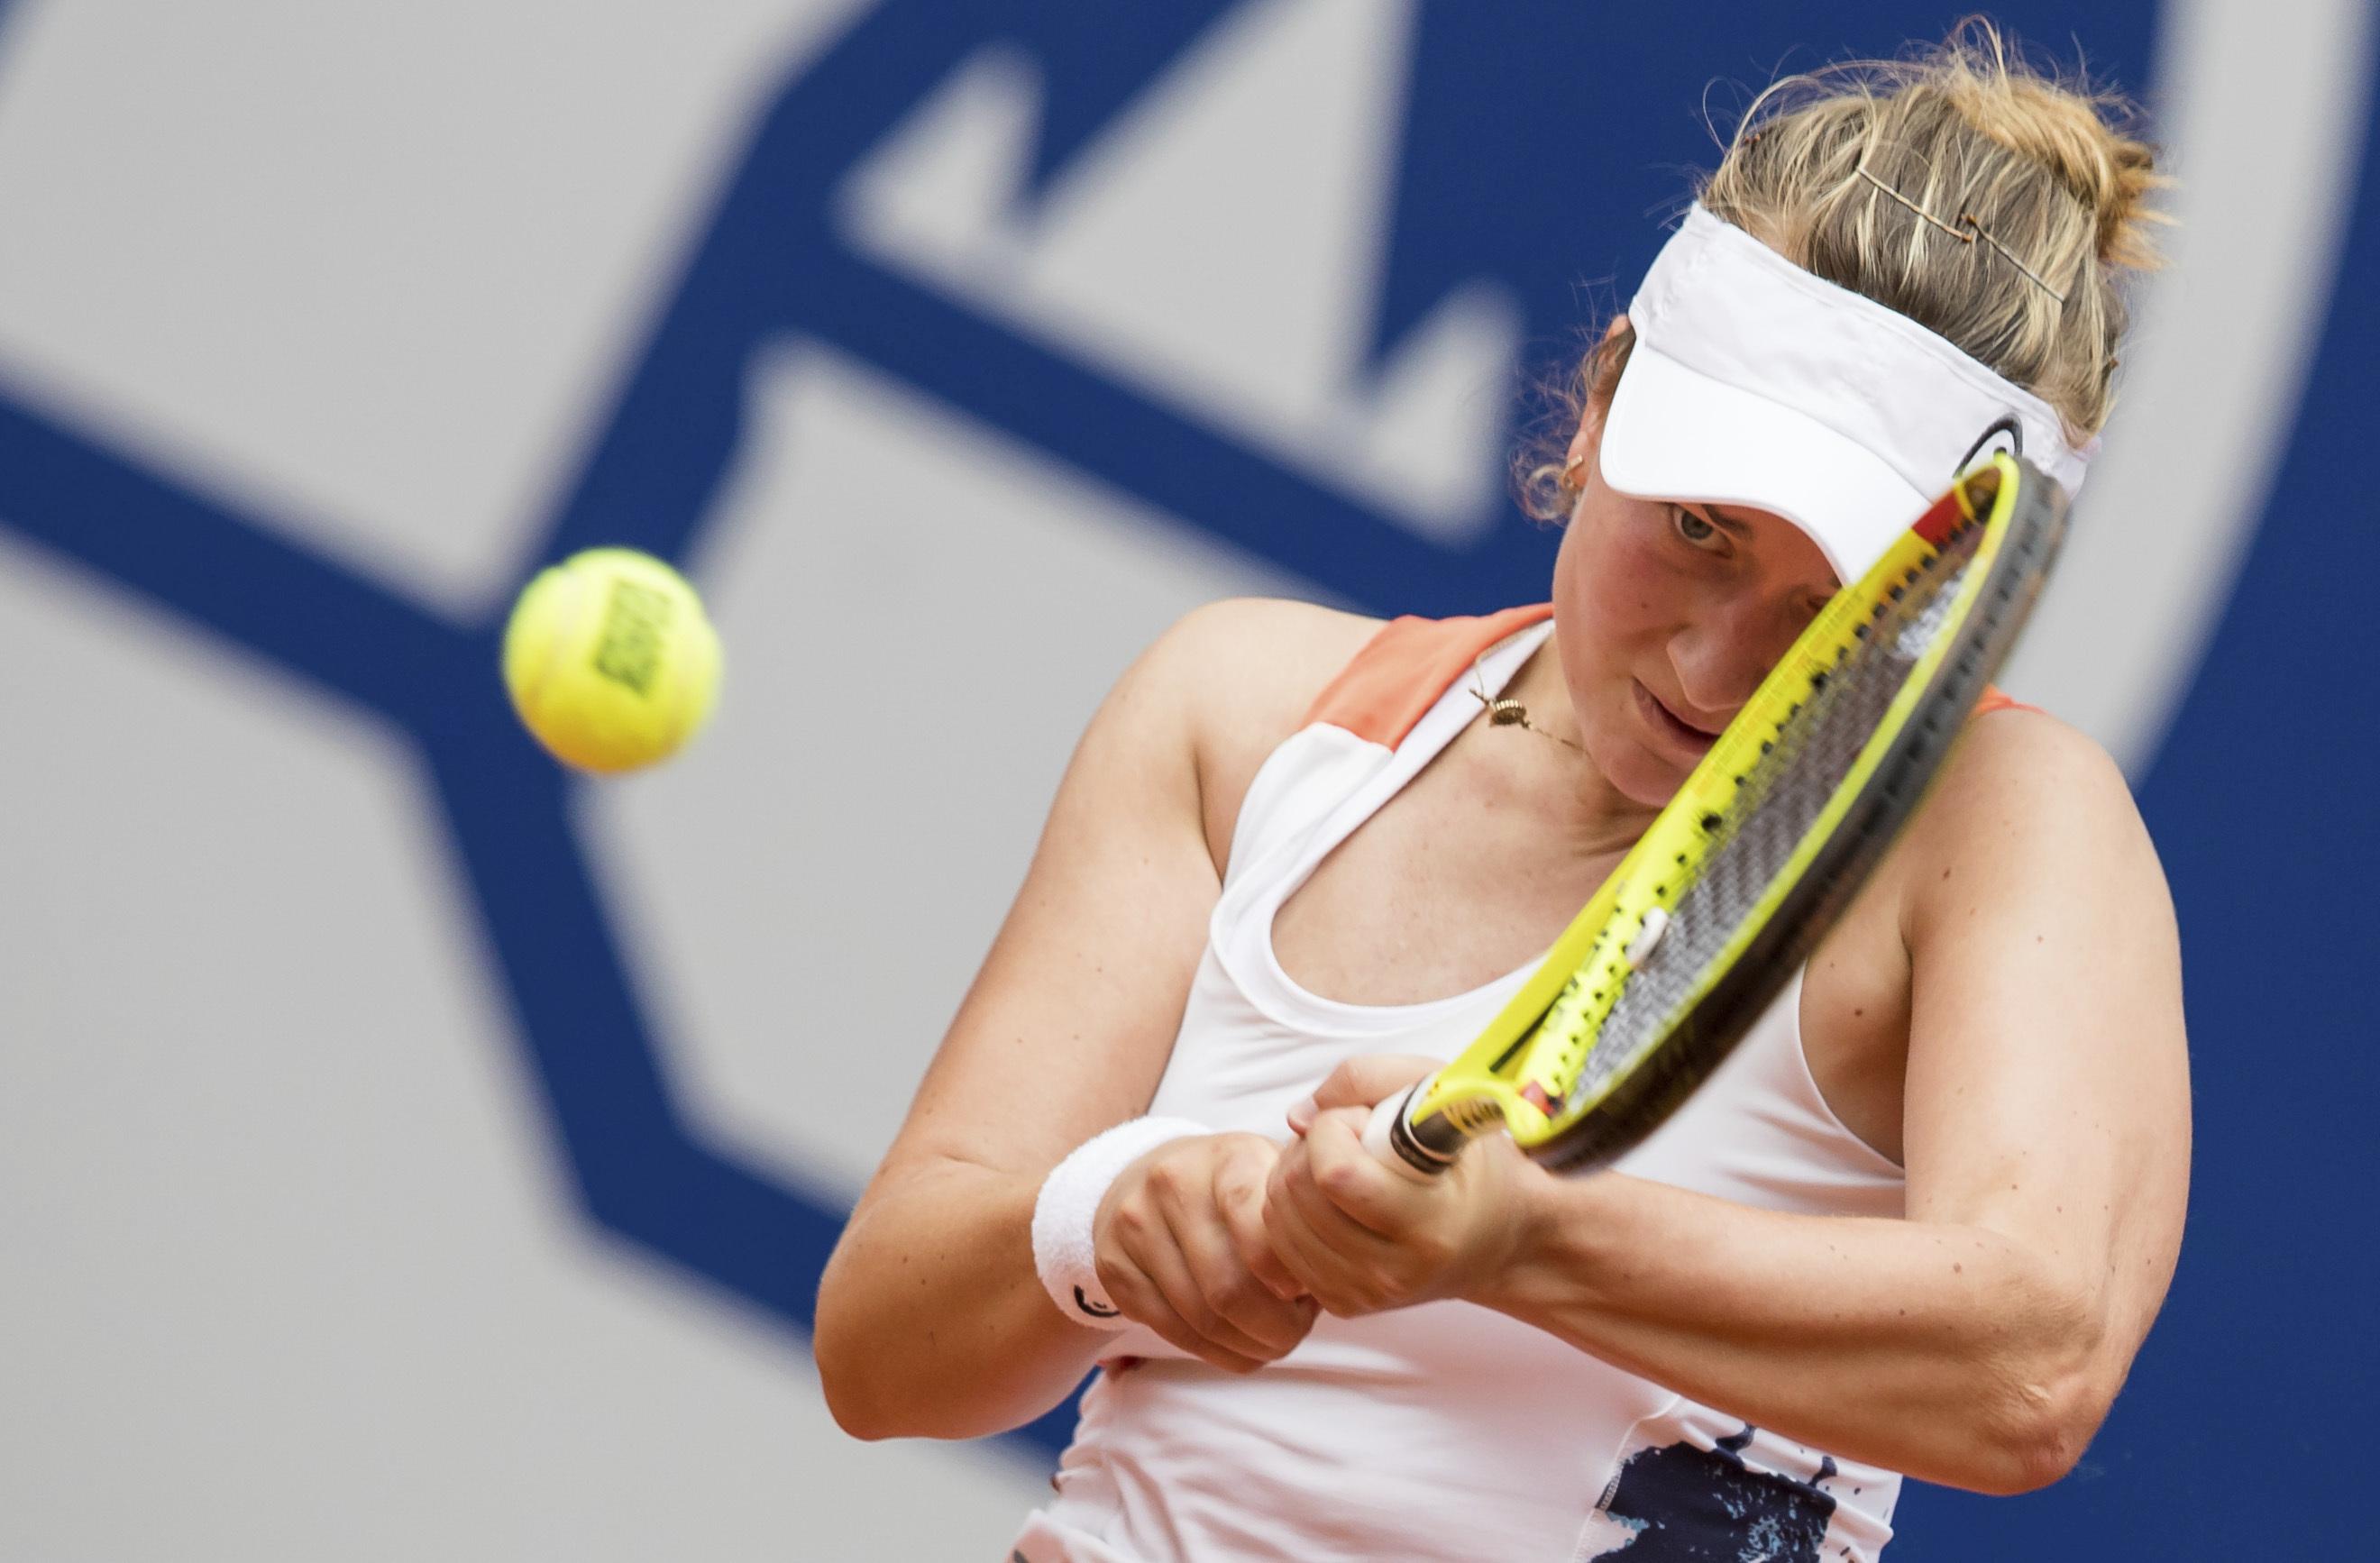 Czech player Barbora Krejcikova returns a ball to Germany's  Carina Witthoeft, during their quarterfinal  match at the Nuremberg Cup tennis tournament in Nuremberg, Germany, Thursday, May 25, 2017. ( Daniel Karmann/dpa via AP)